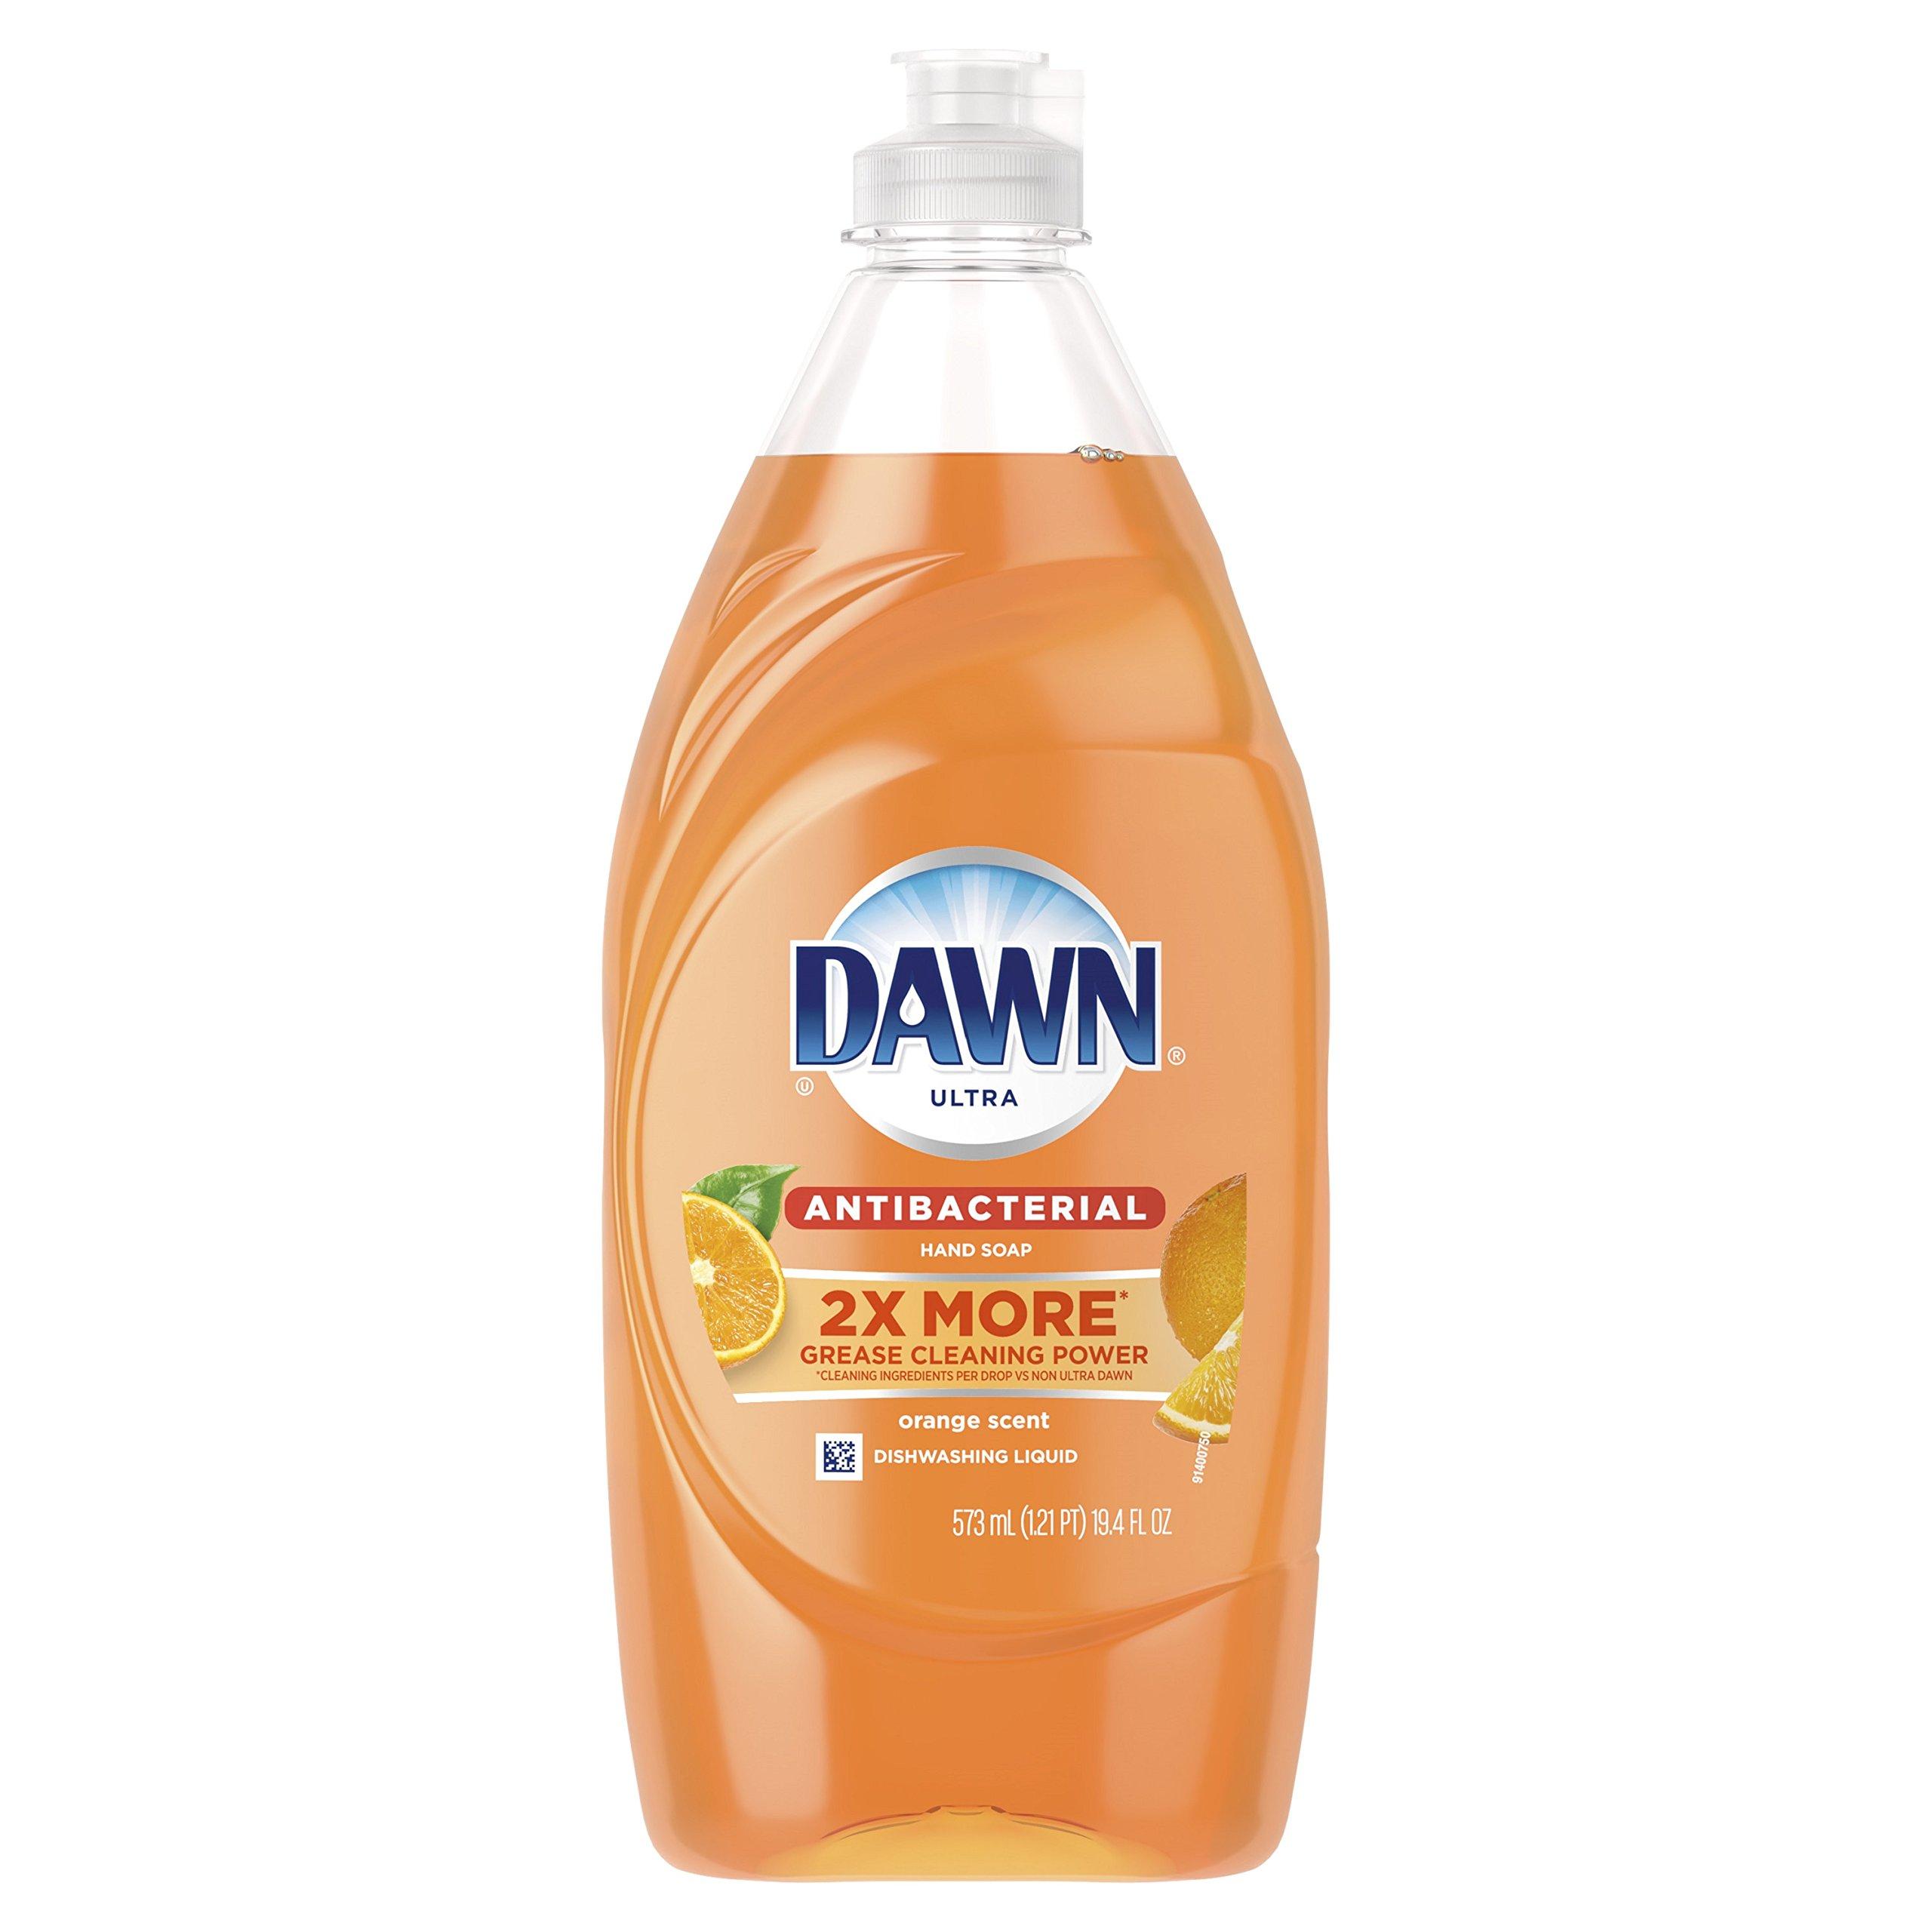 Dawn Ultra Antibacterial Hand Soap, Orange, 19.4 Fluid Ounce (Packaging May Vary)